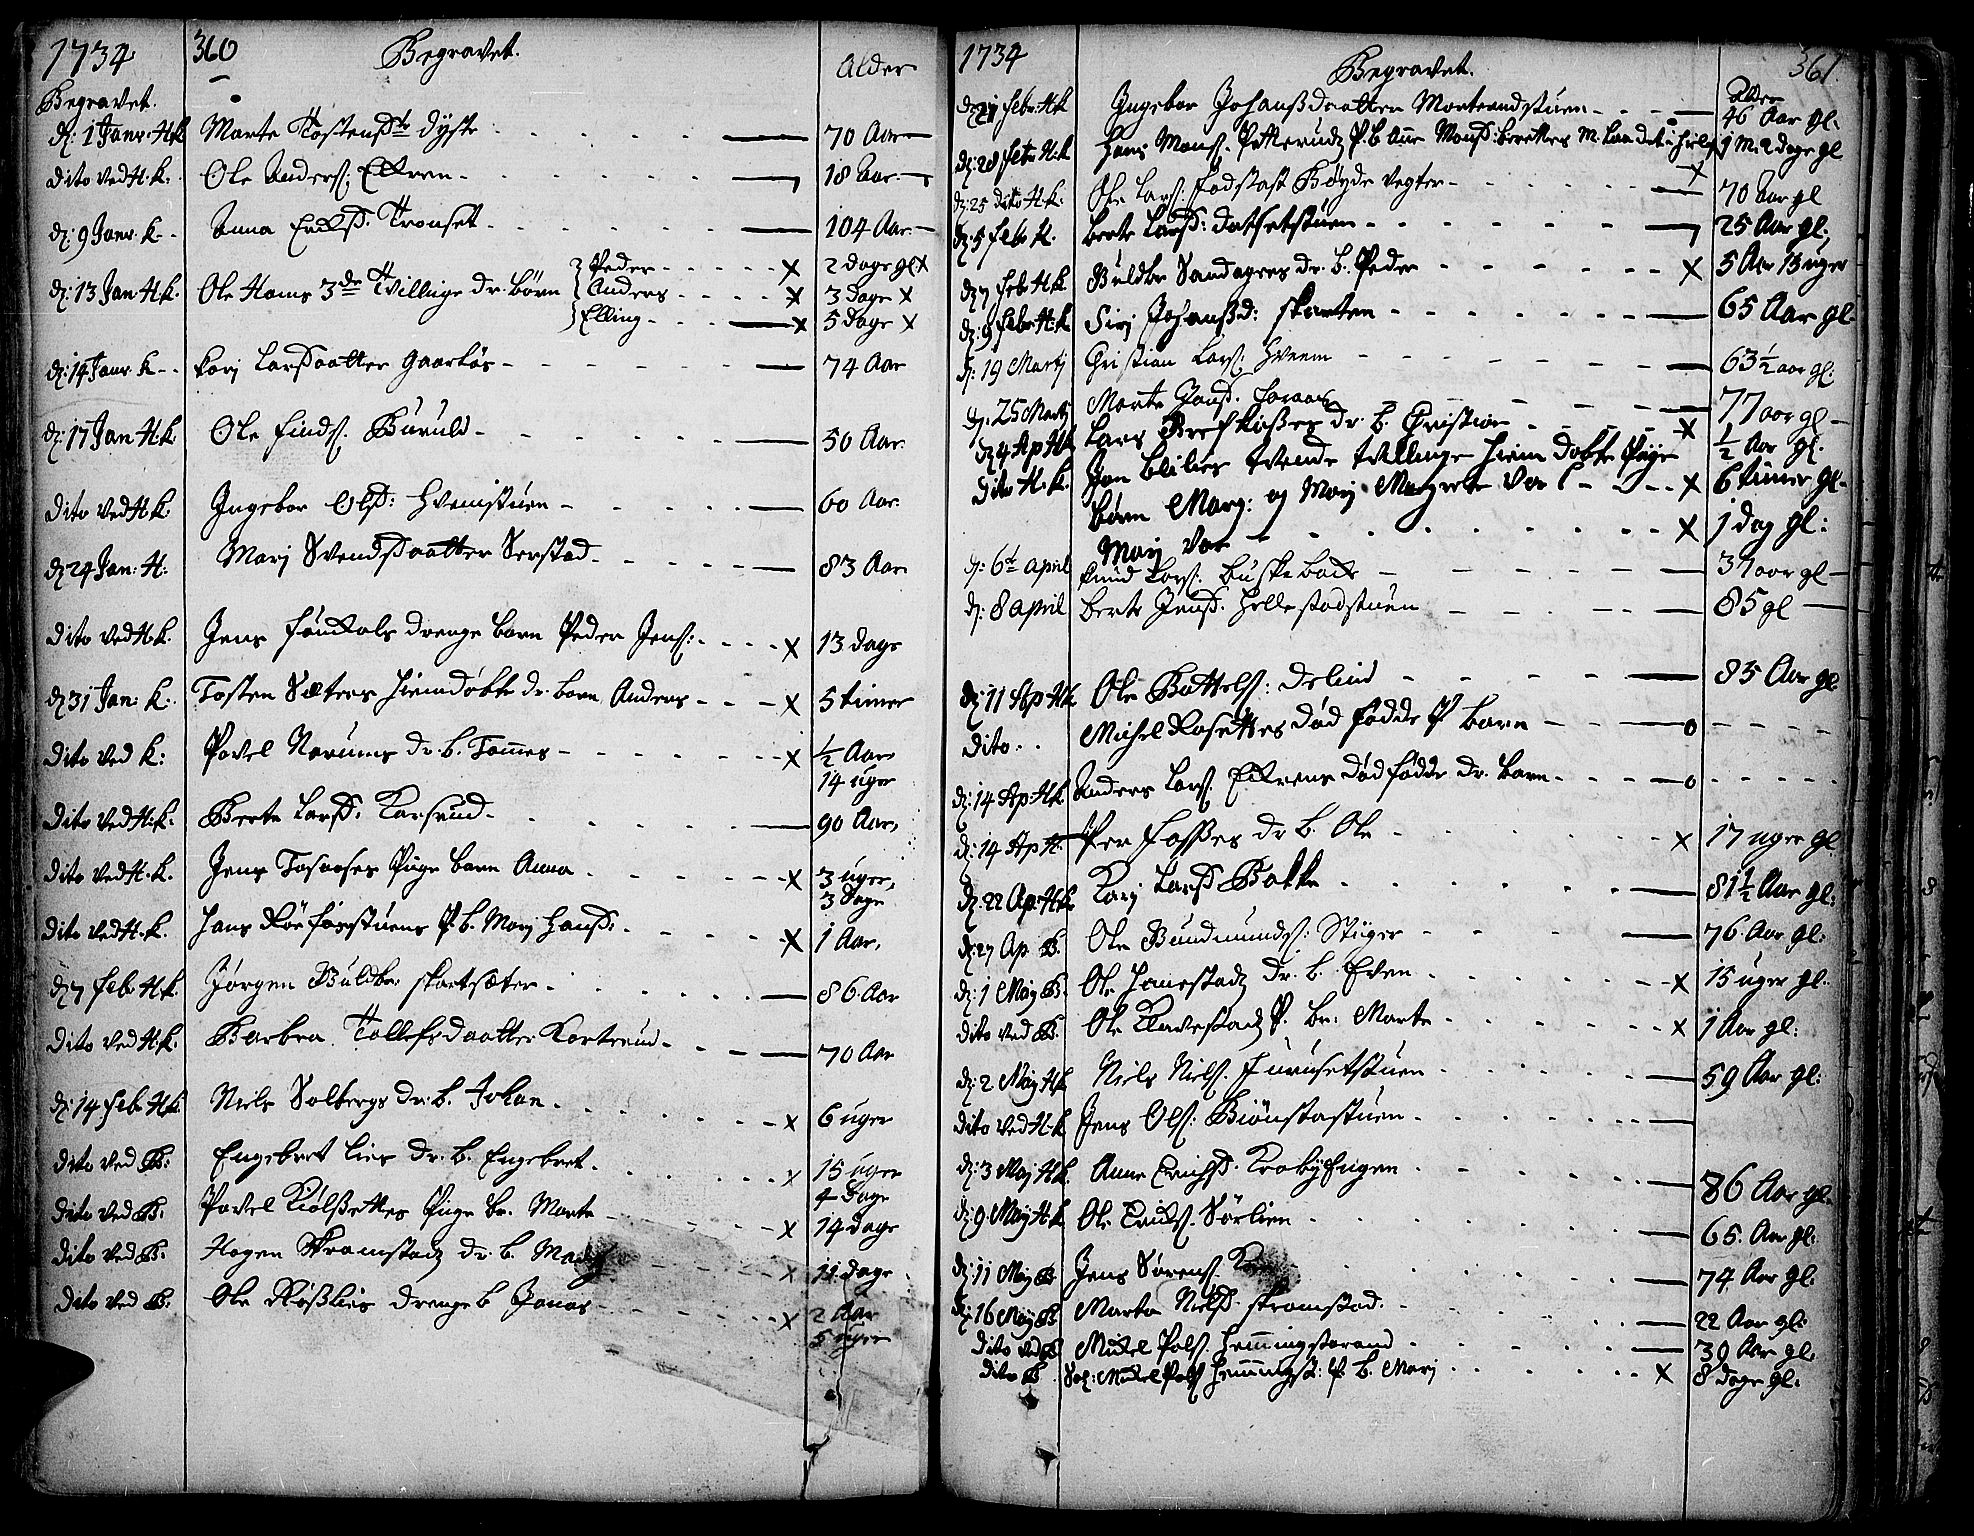 SAH, Toten prestekontor, Ministerialbok nr. 3, 1734-1751, s. 360-361